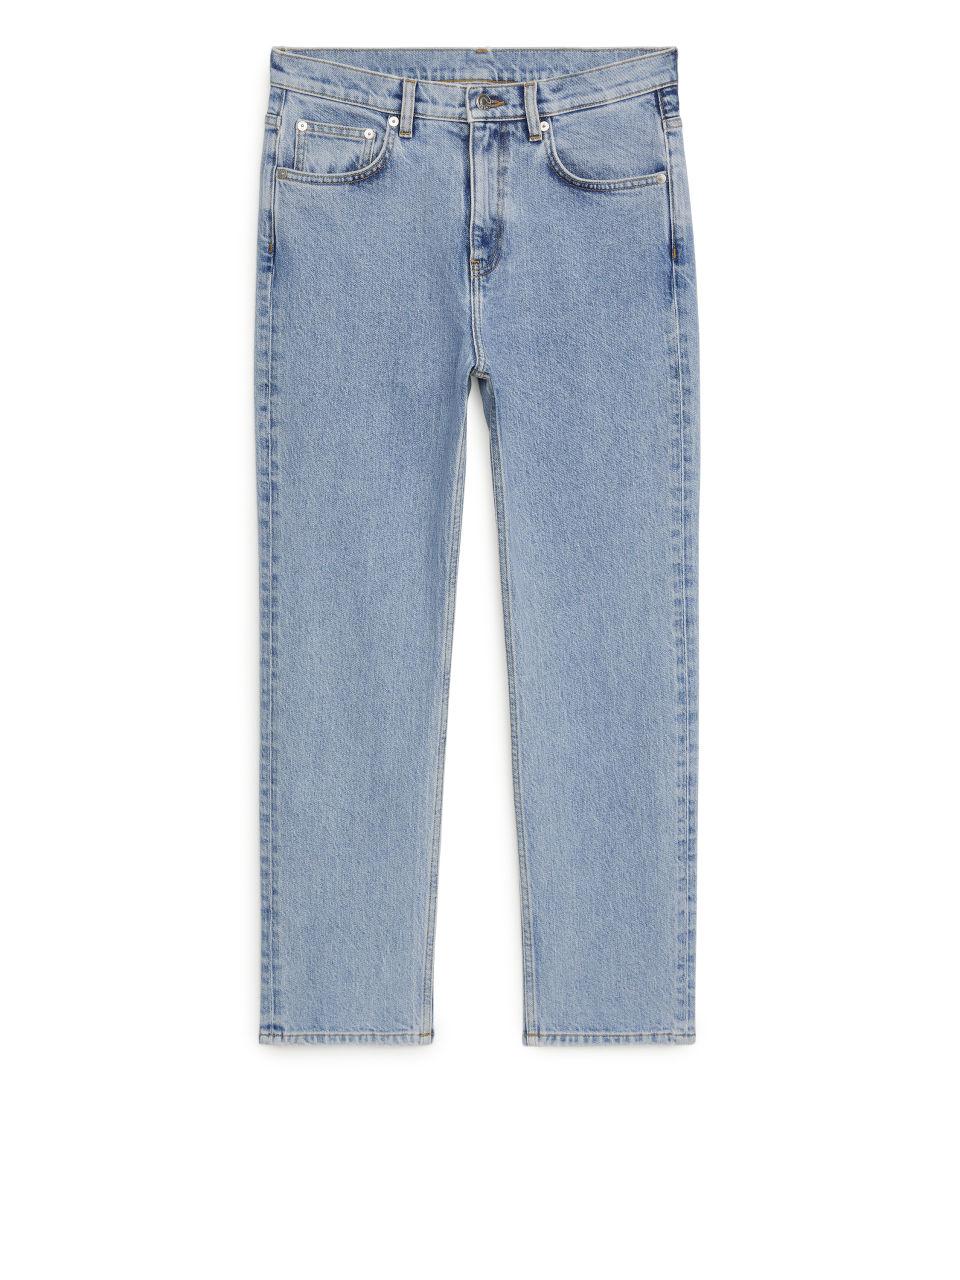 REGULAR CROPPED STRETCH Jeans - Blue